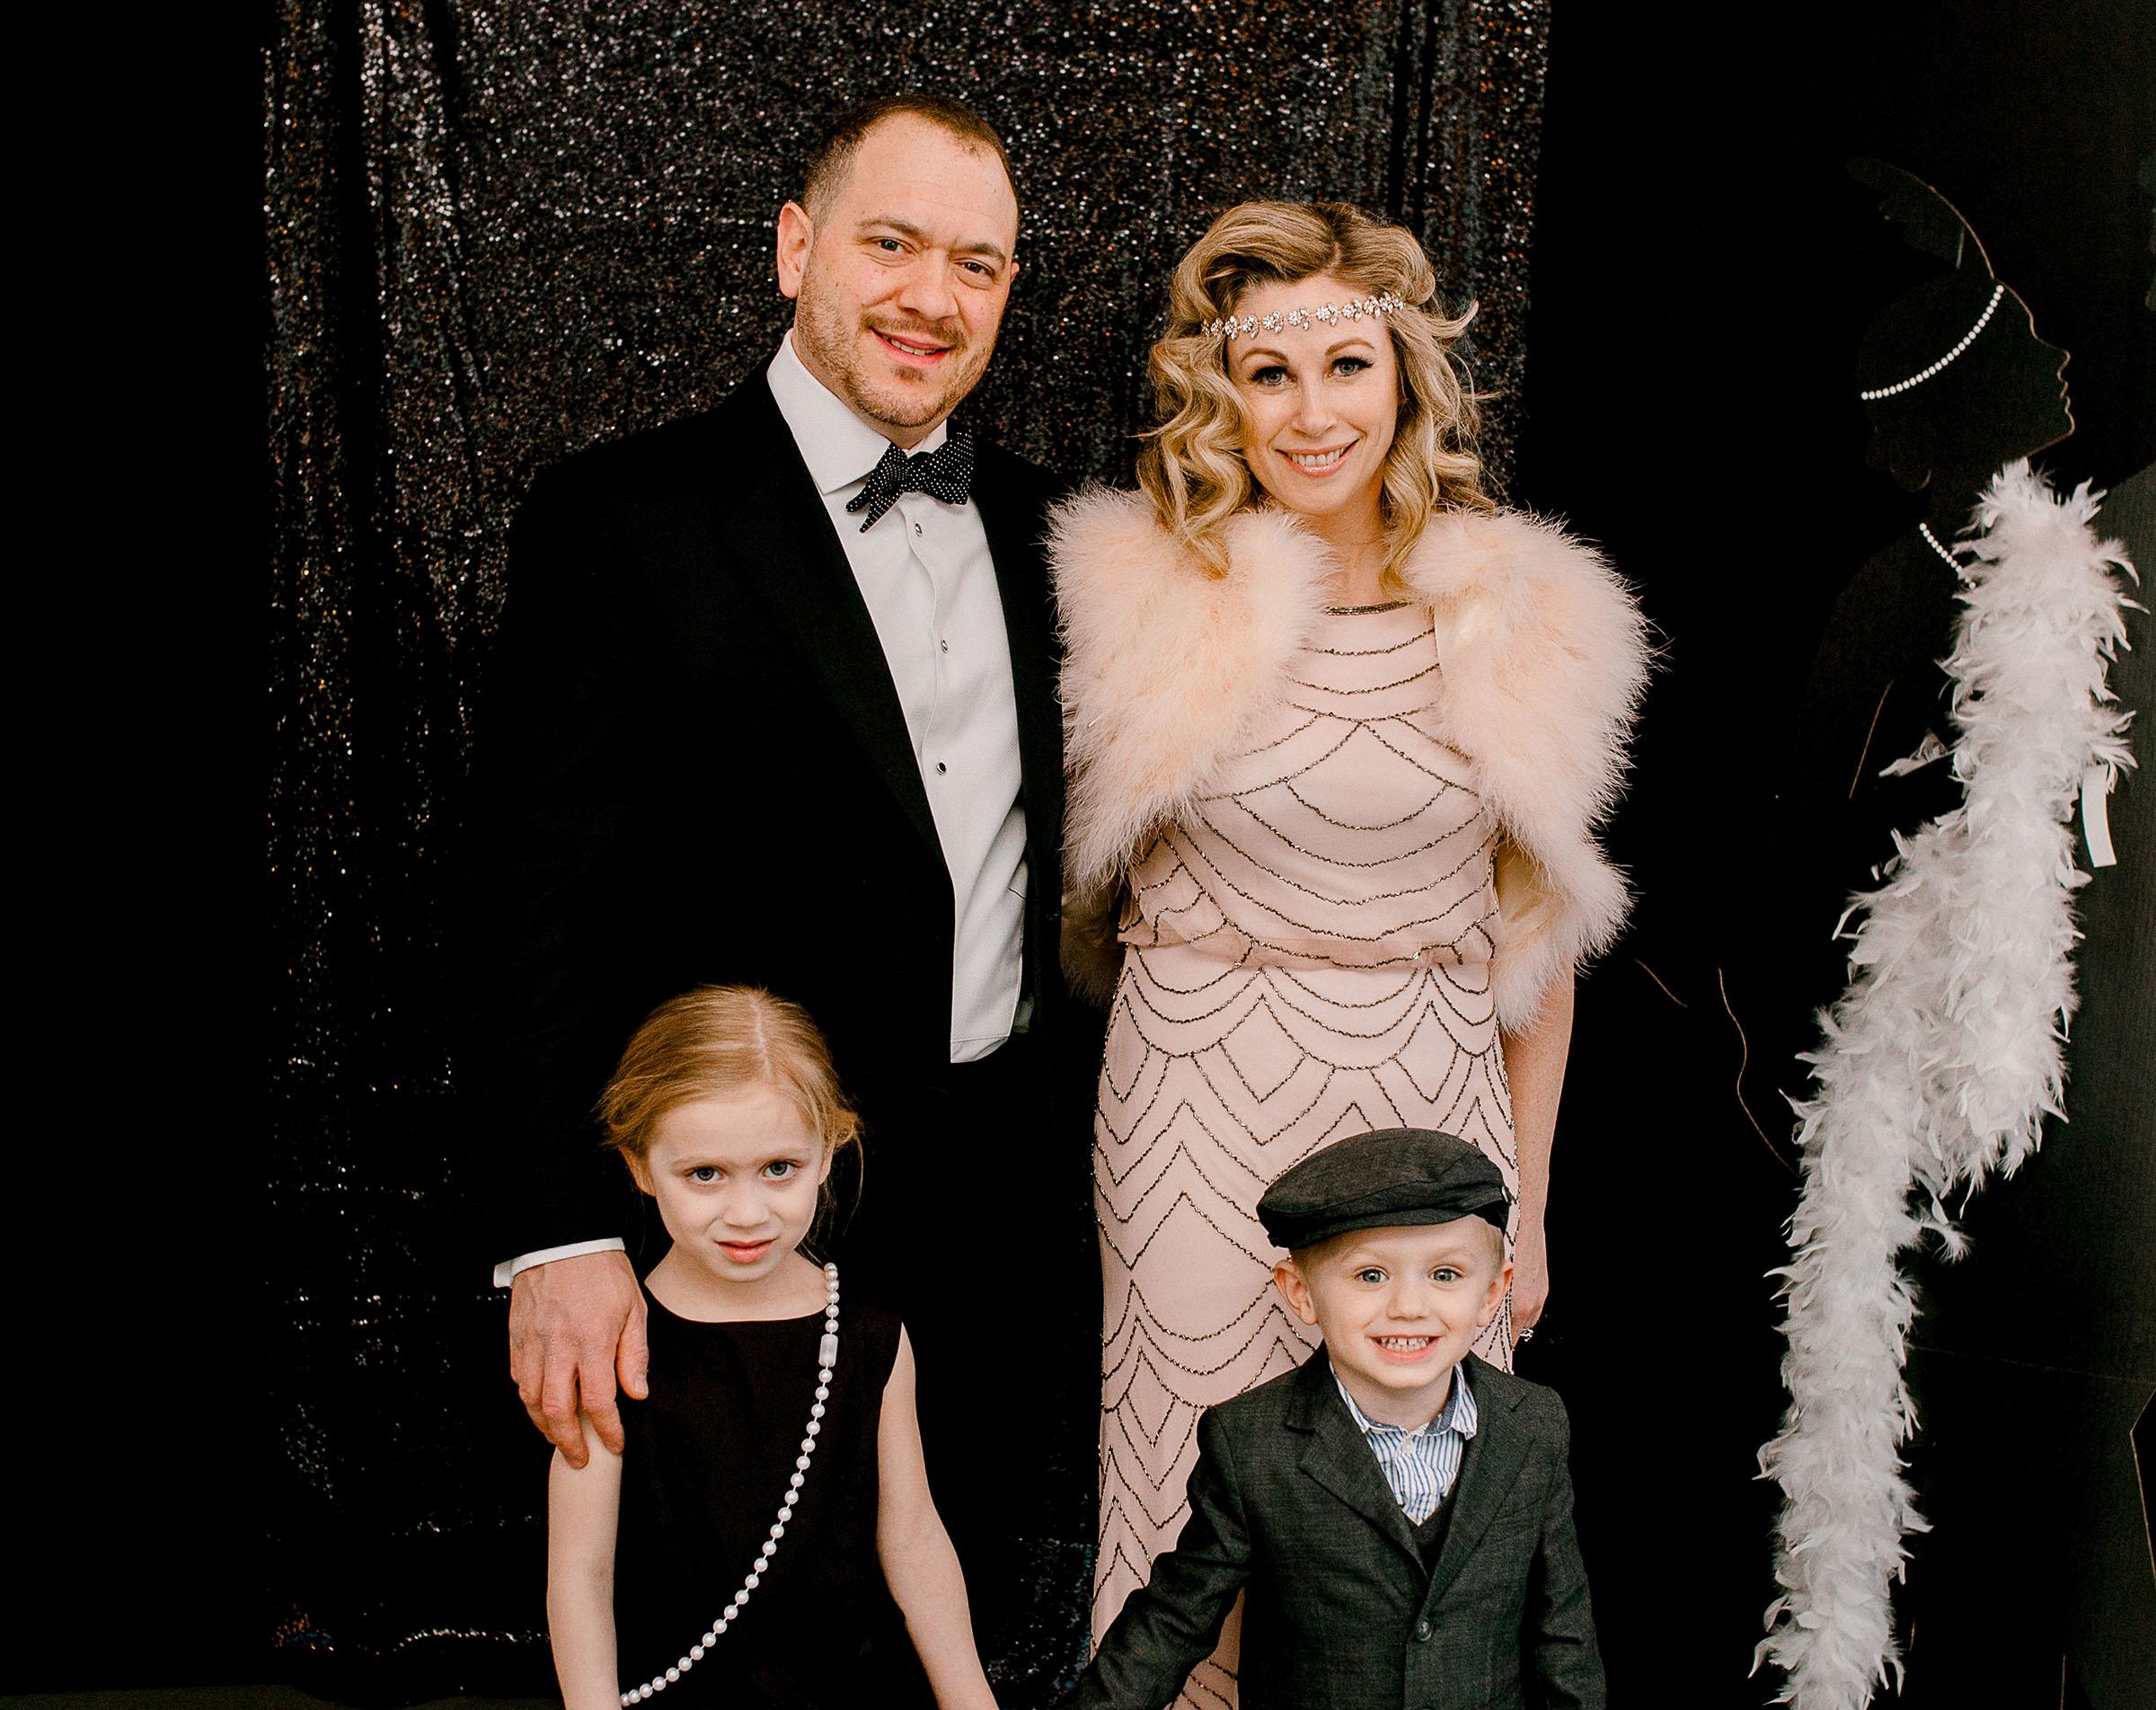 Happy 40th to my amazing husband